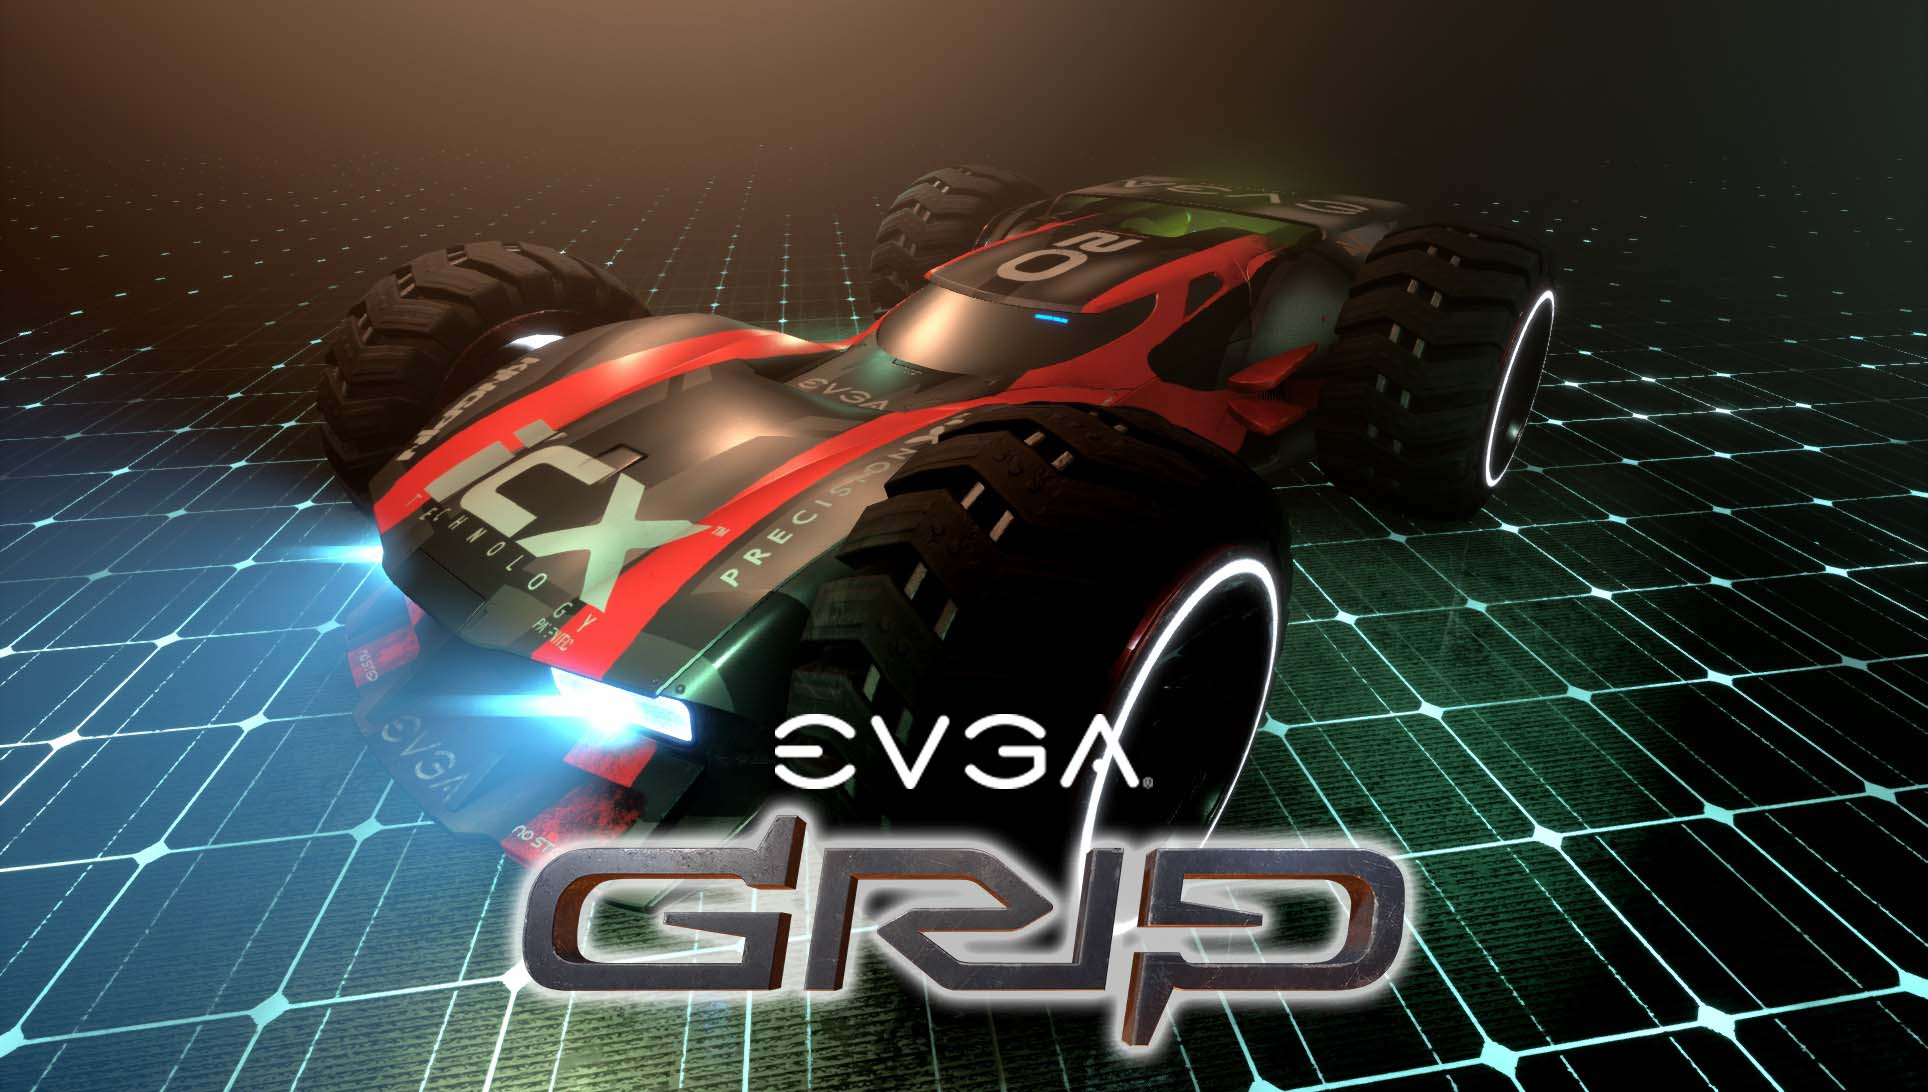 EVGA Bundles GRIP: Combat Racing Game and Skin with EVGA